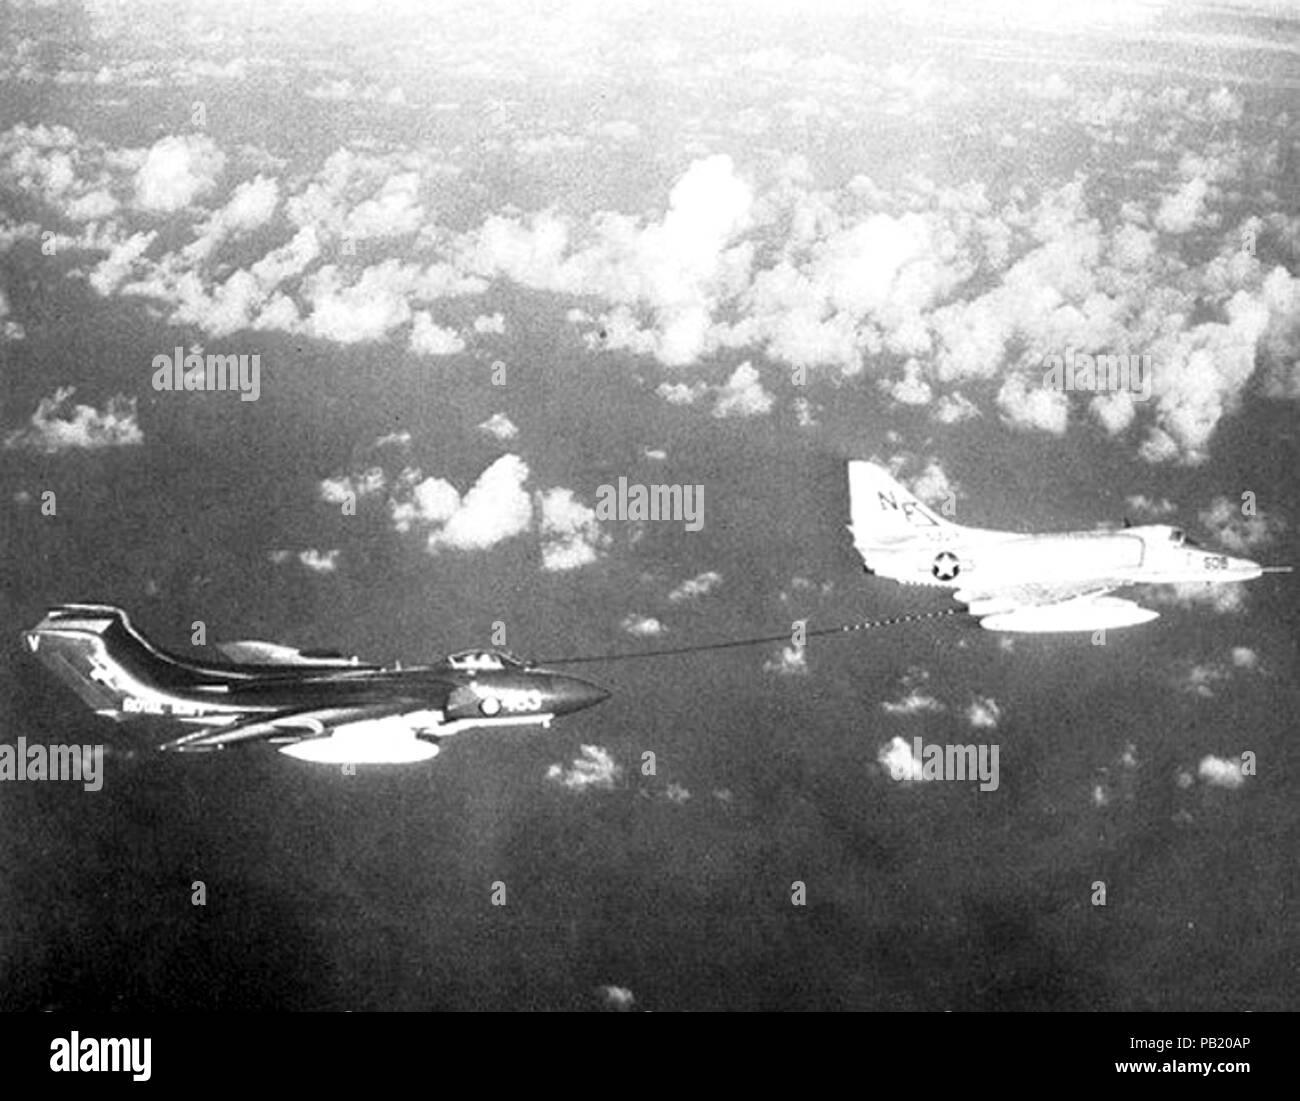 A-4E Skyhawk of VA-55 refuels Sea Vixen FAW2 of 893 NAS in May 1964. - Stock Image